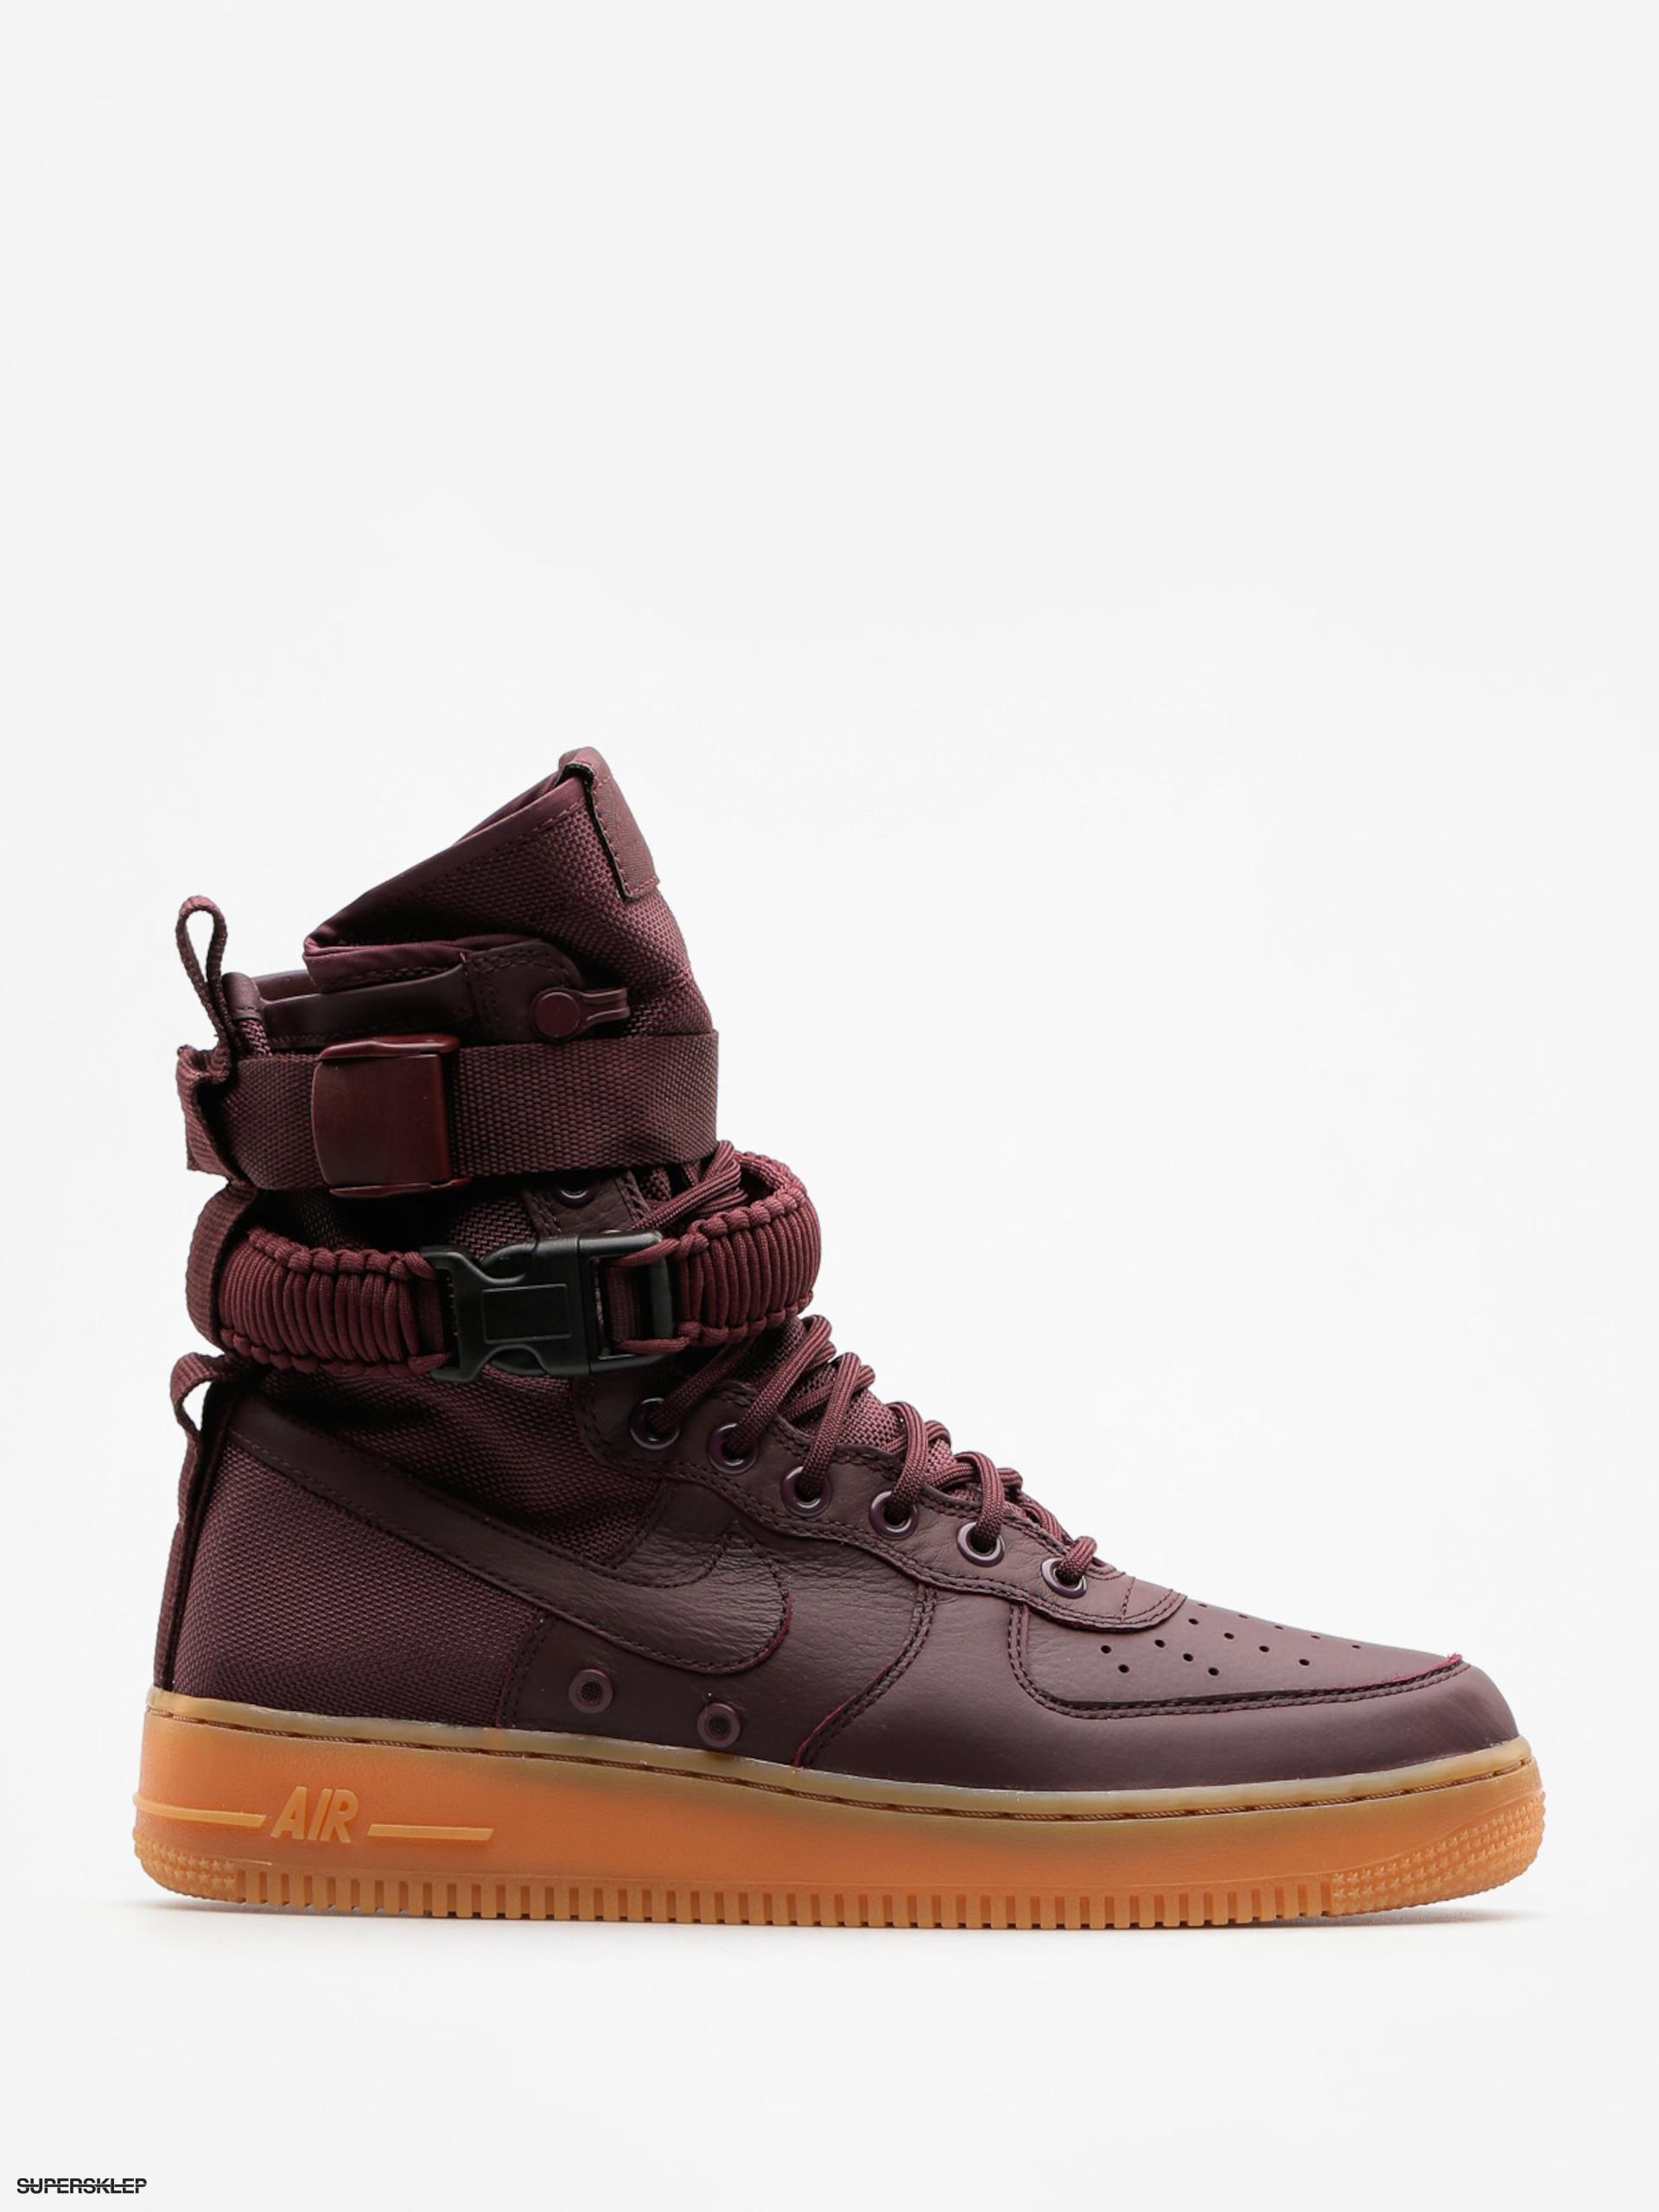 38e8846cb6e64 Topánky Nike Sf Air Force 1 (deep burgundy/deep burgundy black)